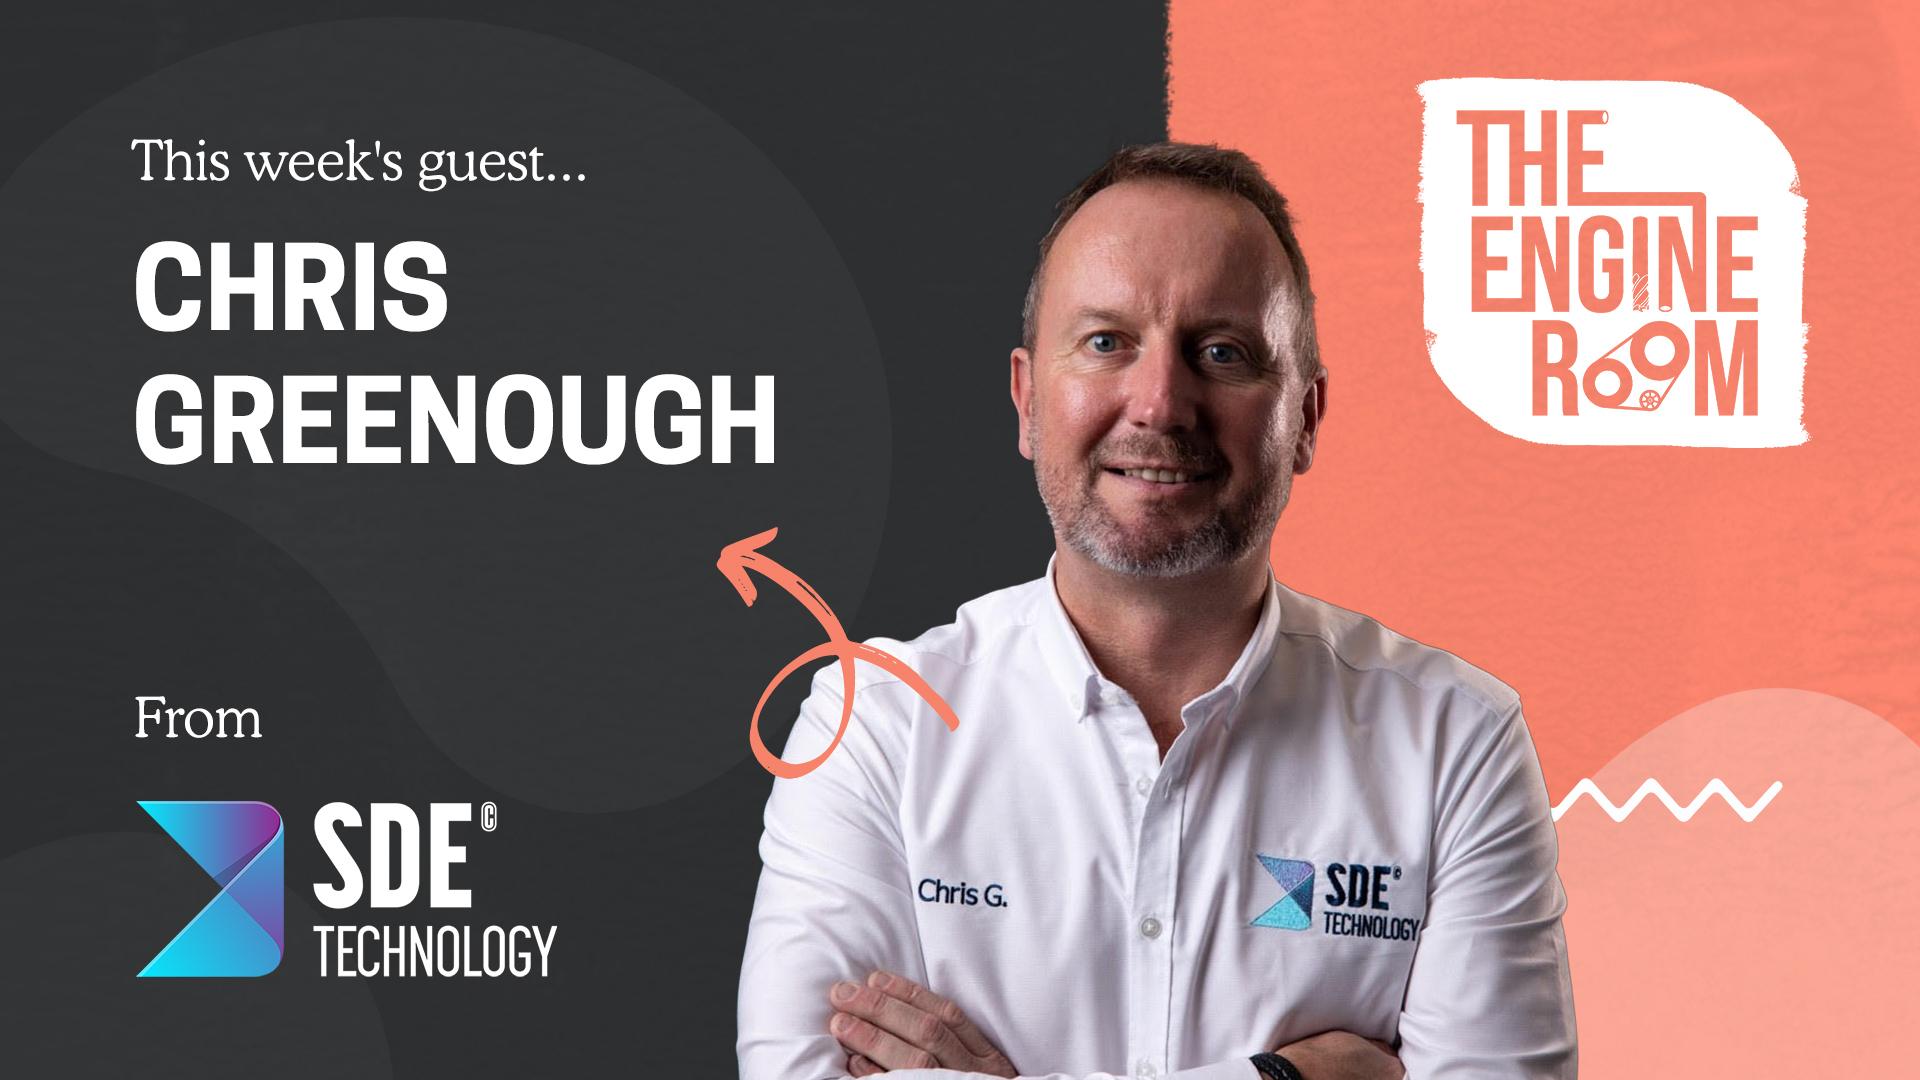 THE ENGINE ROOM - Company Spotlight - Chris Greenough SDE Technology